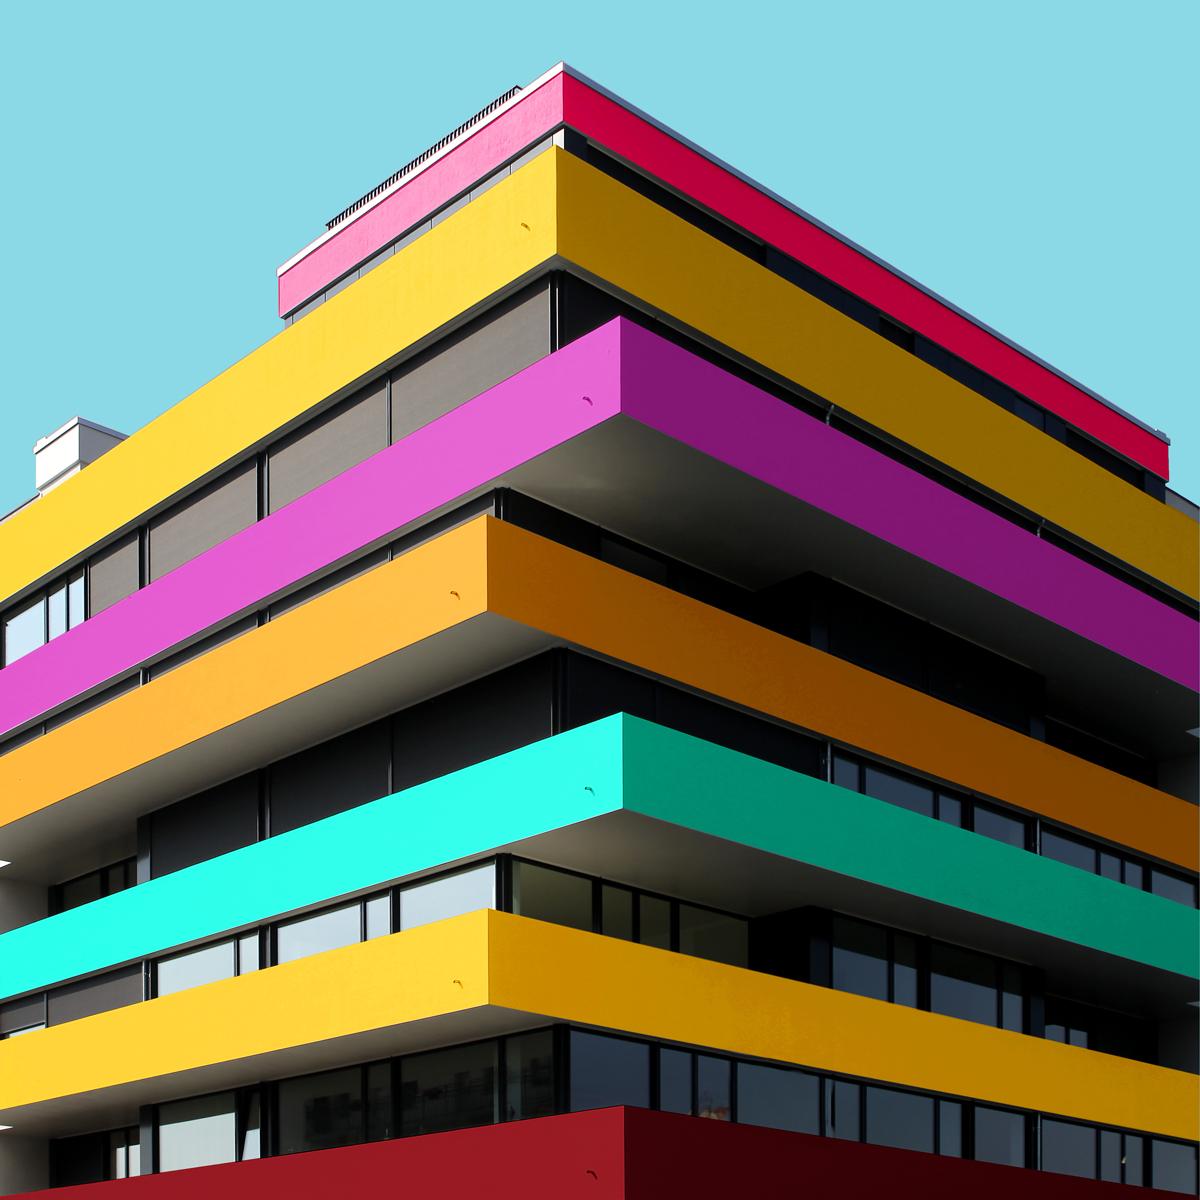 paul-eis-farbe-architektur8